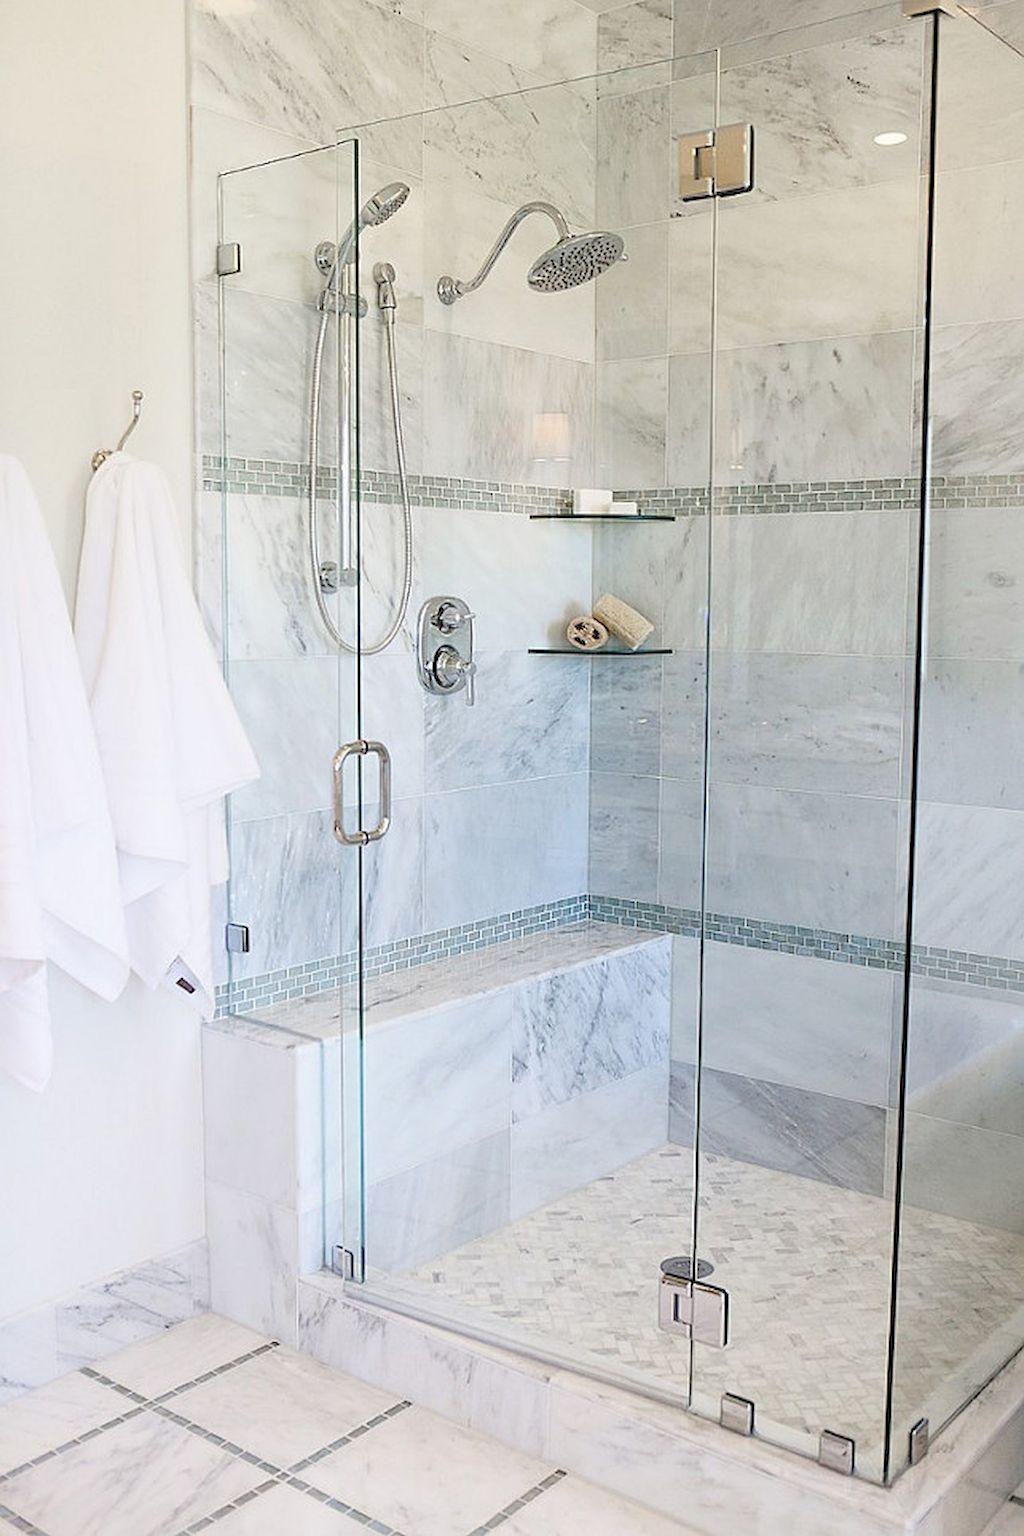 Best small bathroom remodel ideas on a budget (29 | Small bathroom ...